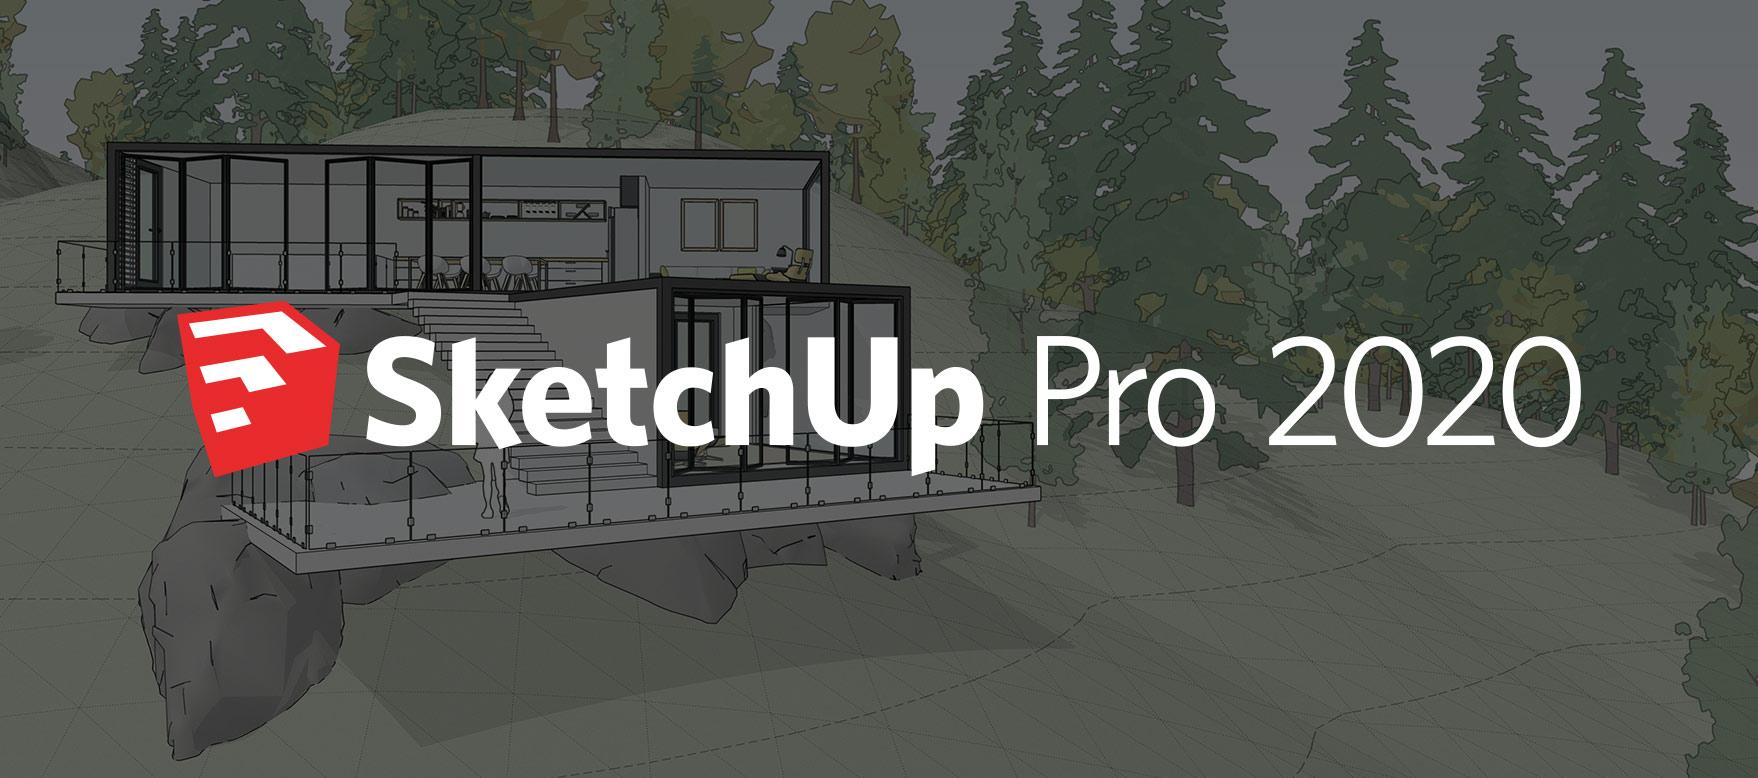 SketchUp Pro 2020 est disponible !